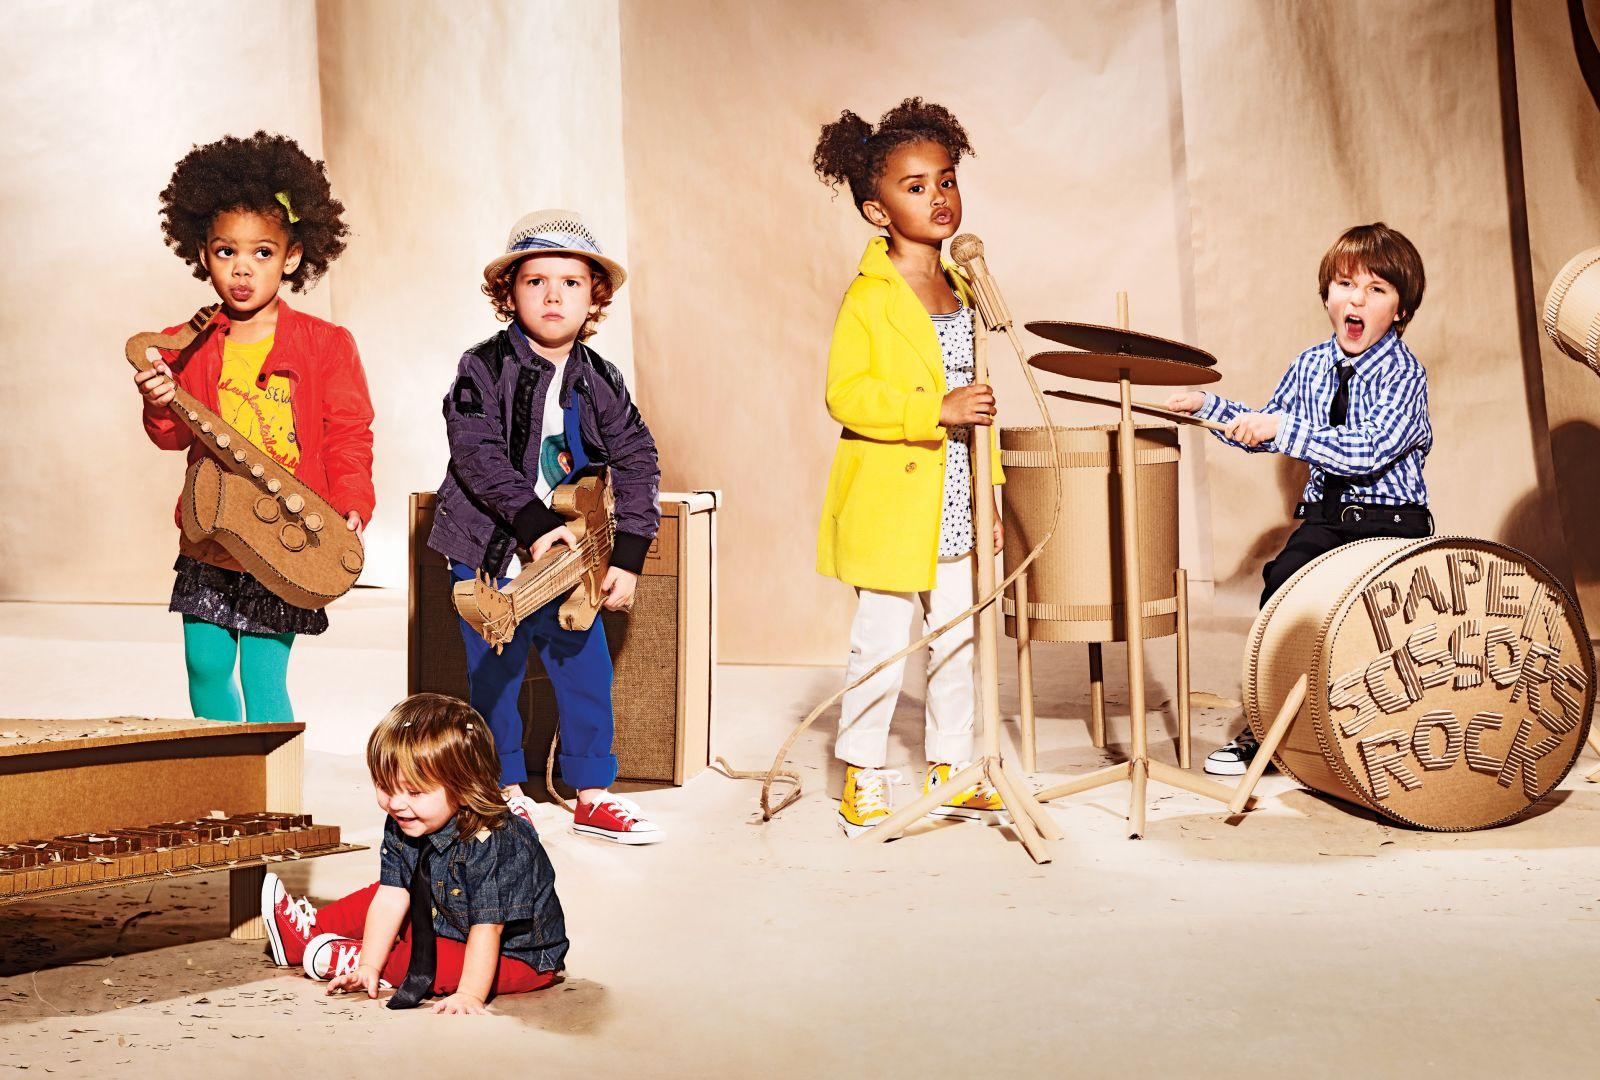 child childrens music school - HD1600×1080